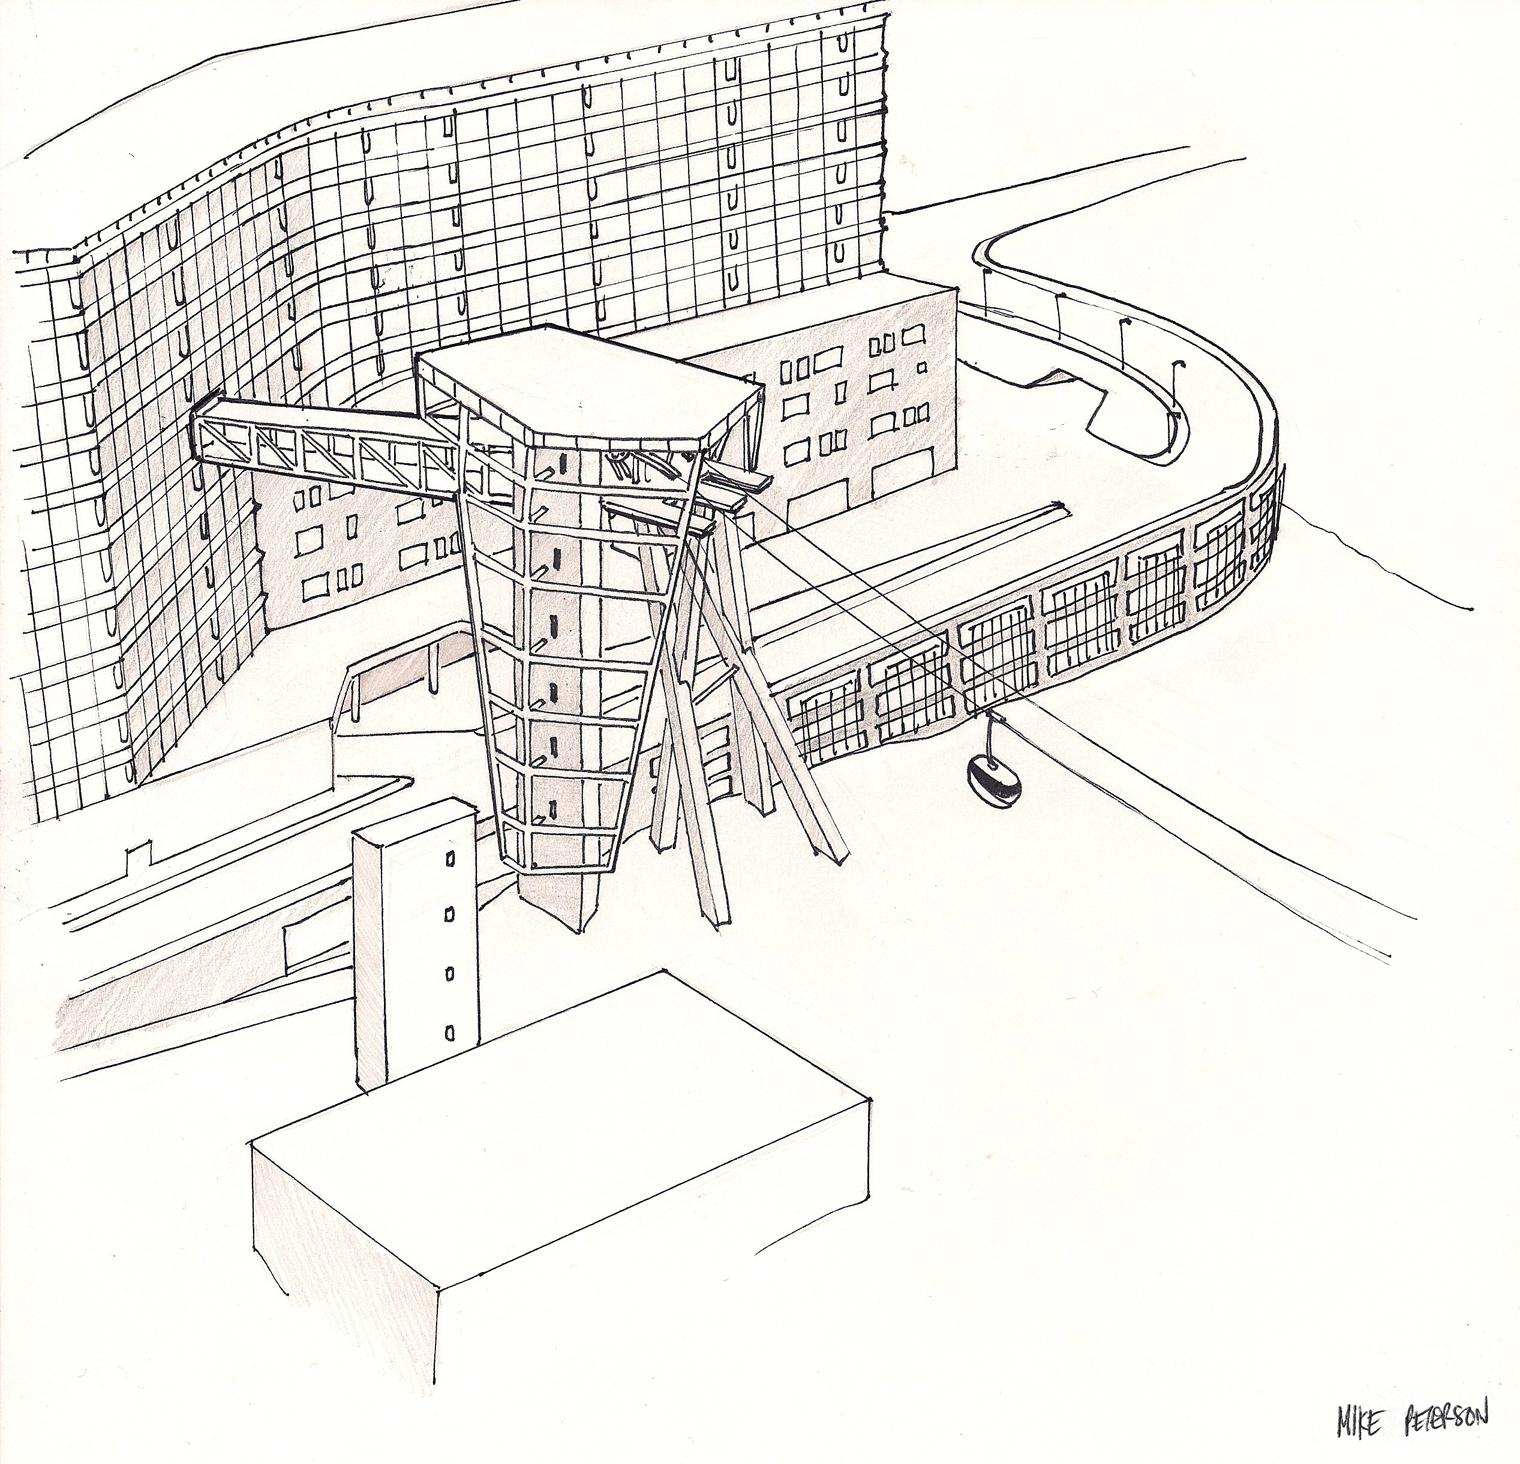 Portland Aerial Tram Sketch